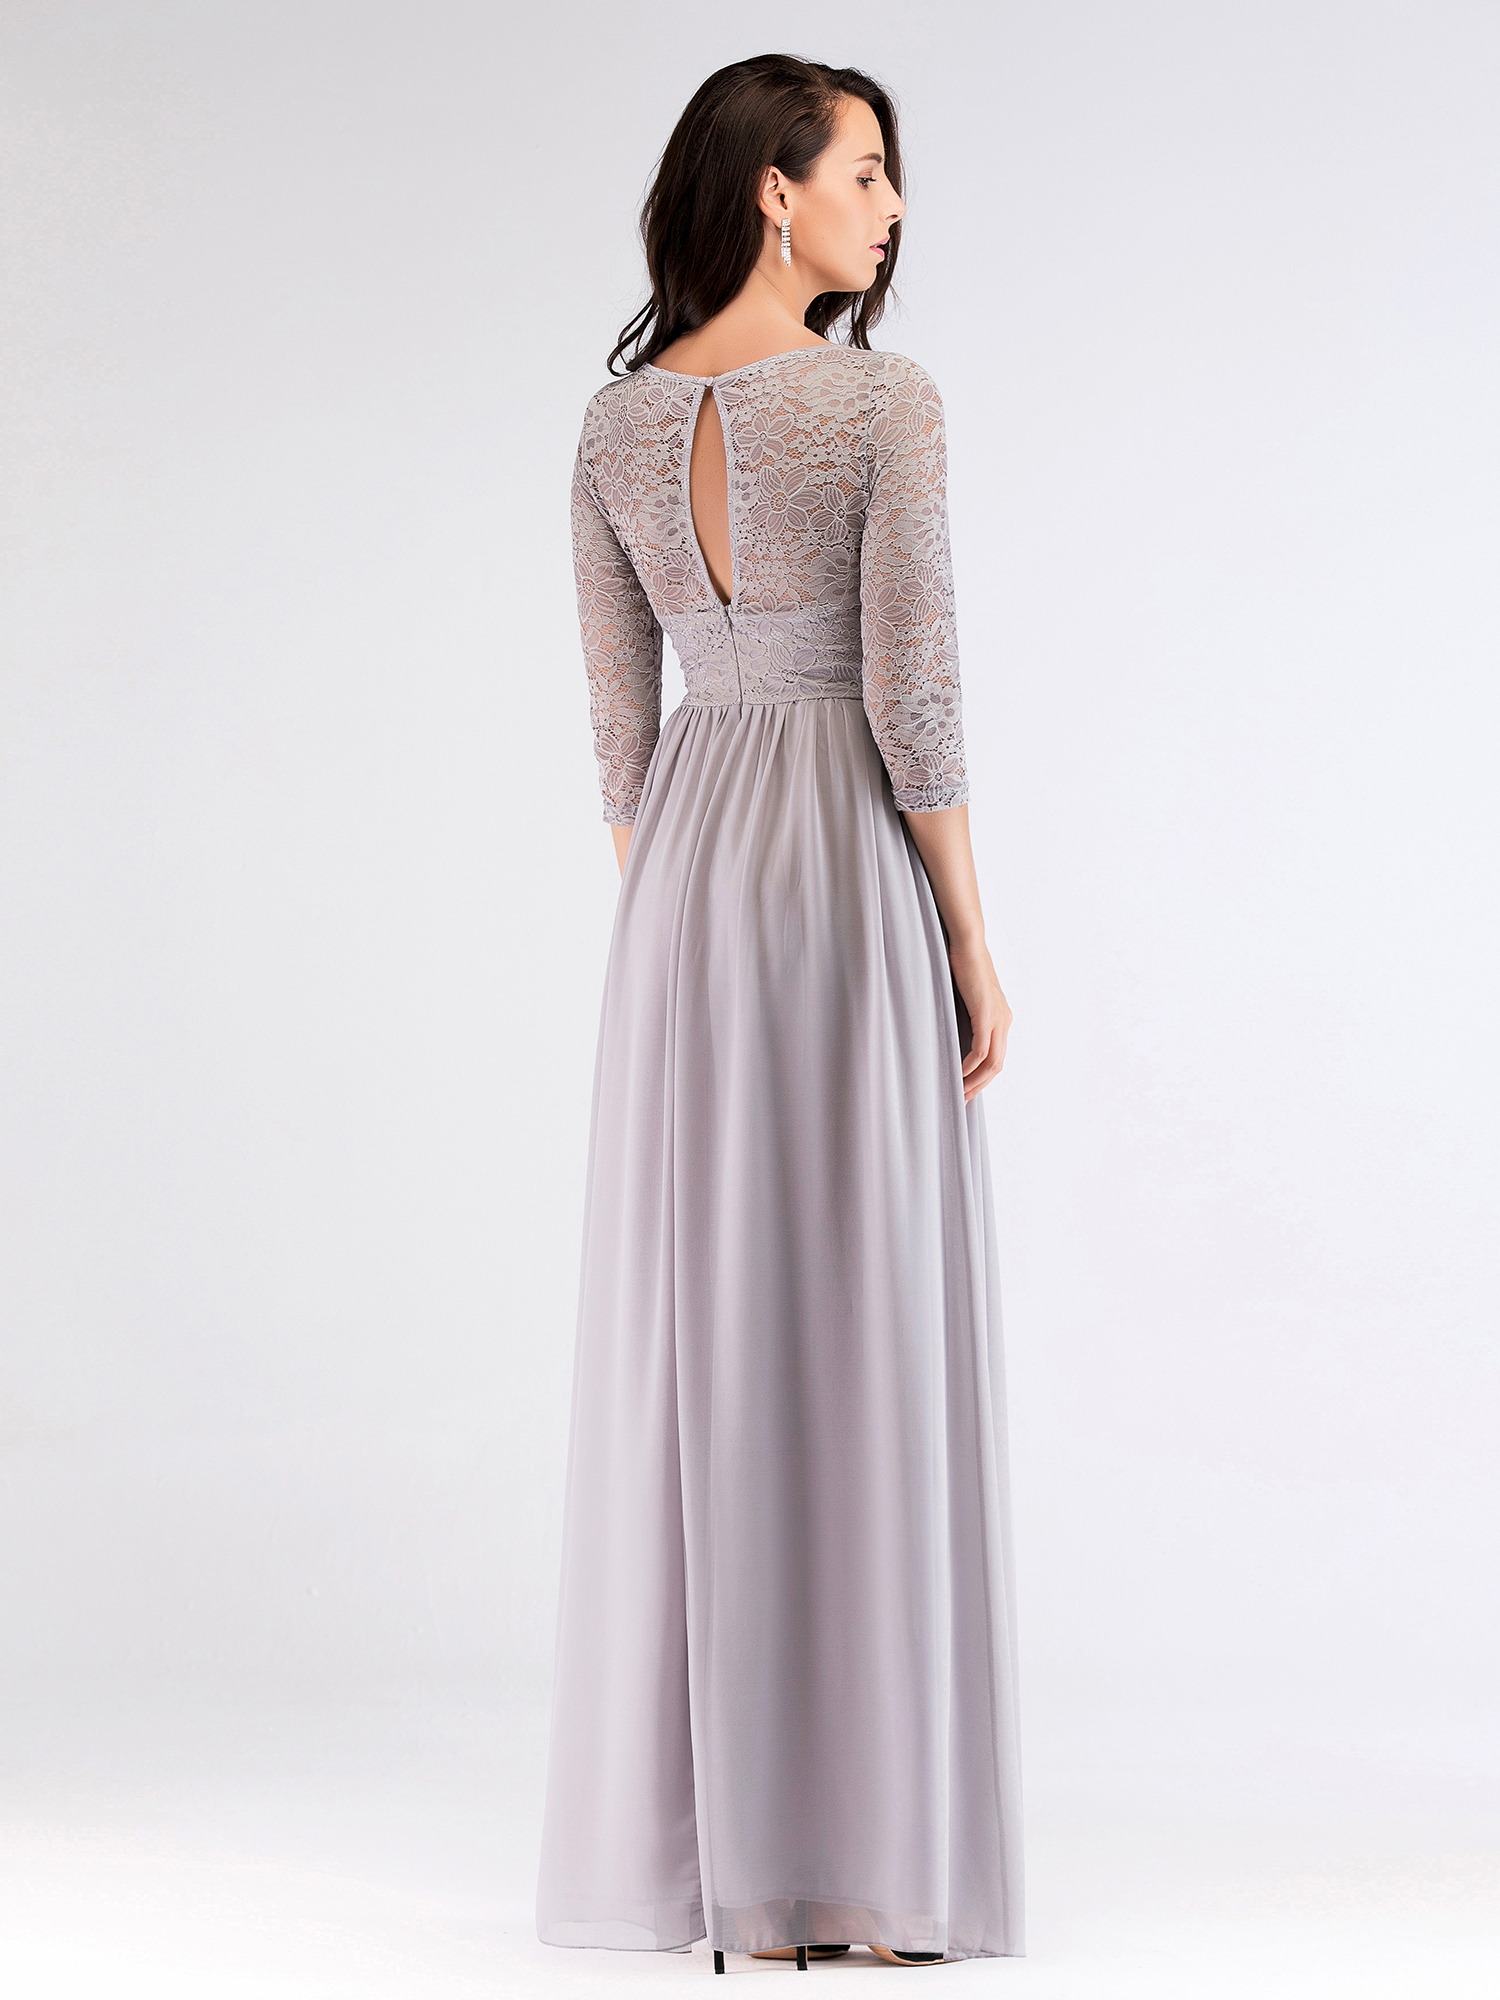 Ever-Pretty-Long-3-4-Lace-Bridesmaid-Dresses-Elegant-Evening-Prom-Party-Dresses thumbnail 12